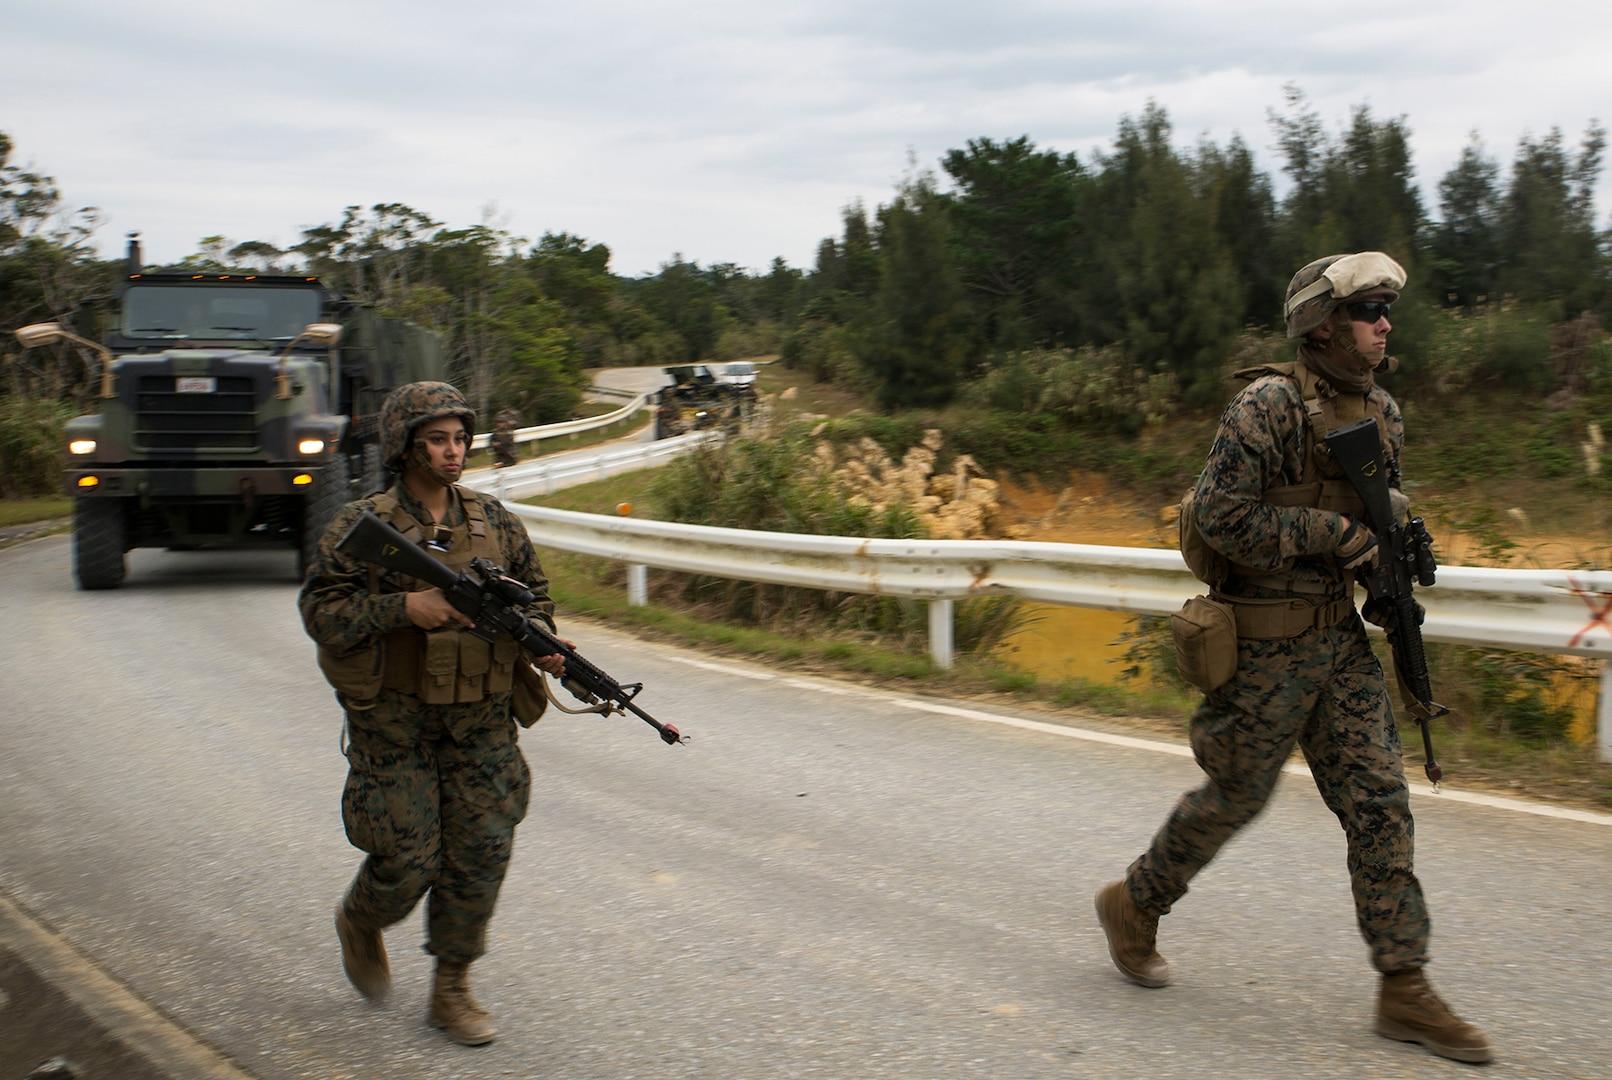 Okinawa-based Marines refine skills during Exercise Samurai